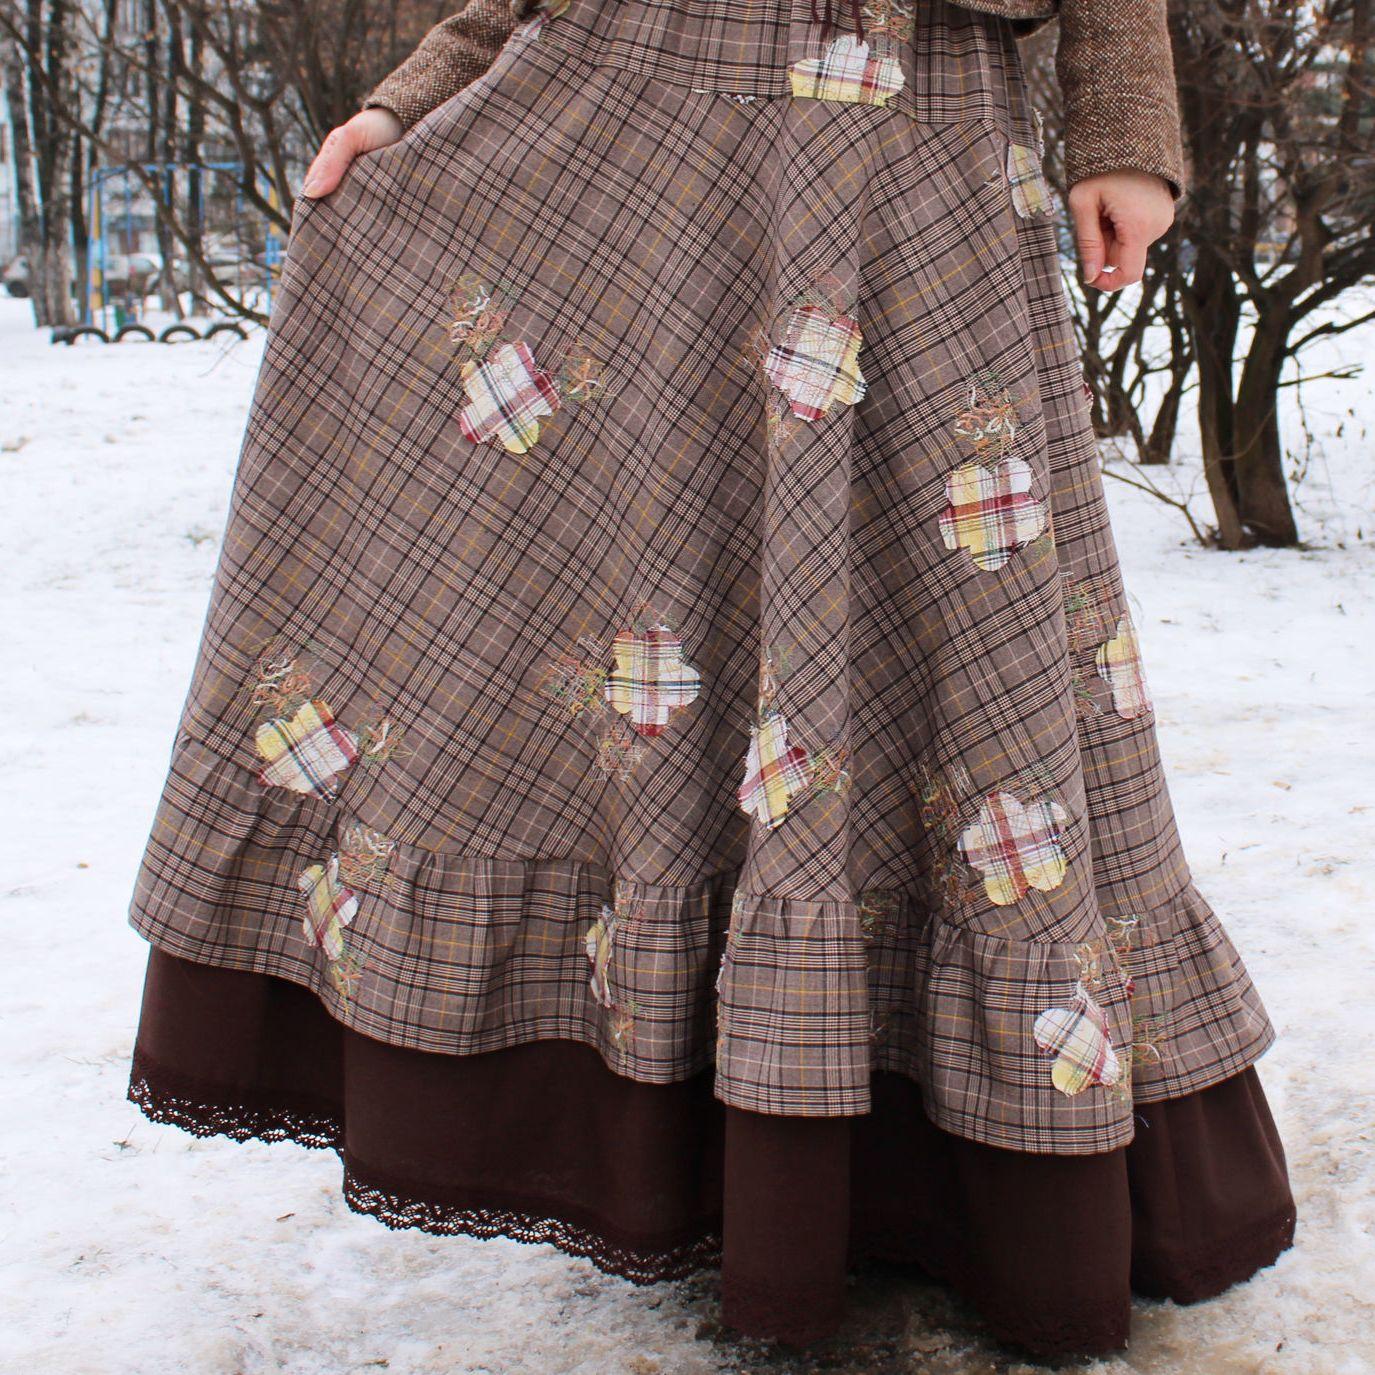 Nata Schu юбка двойная в стиле бохо